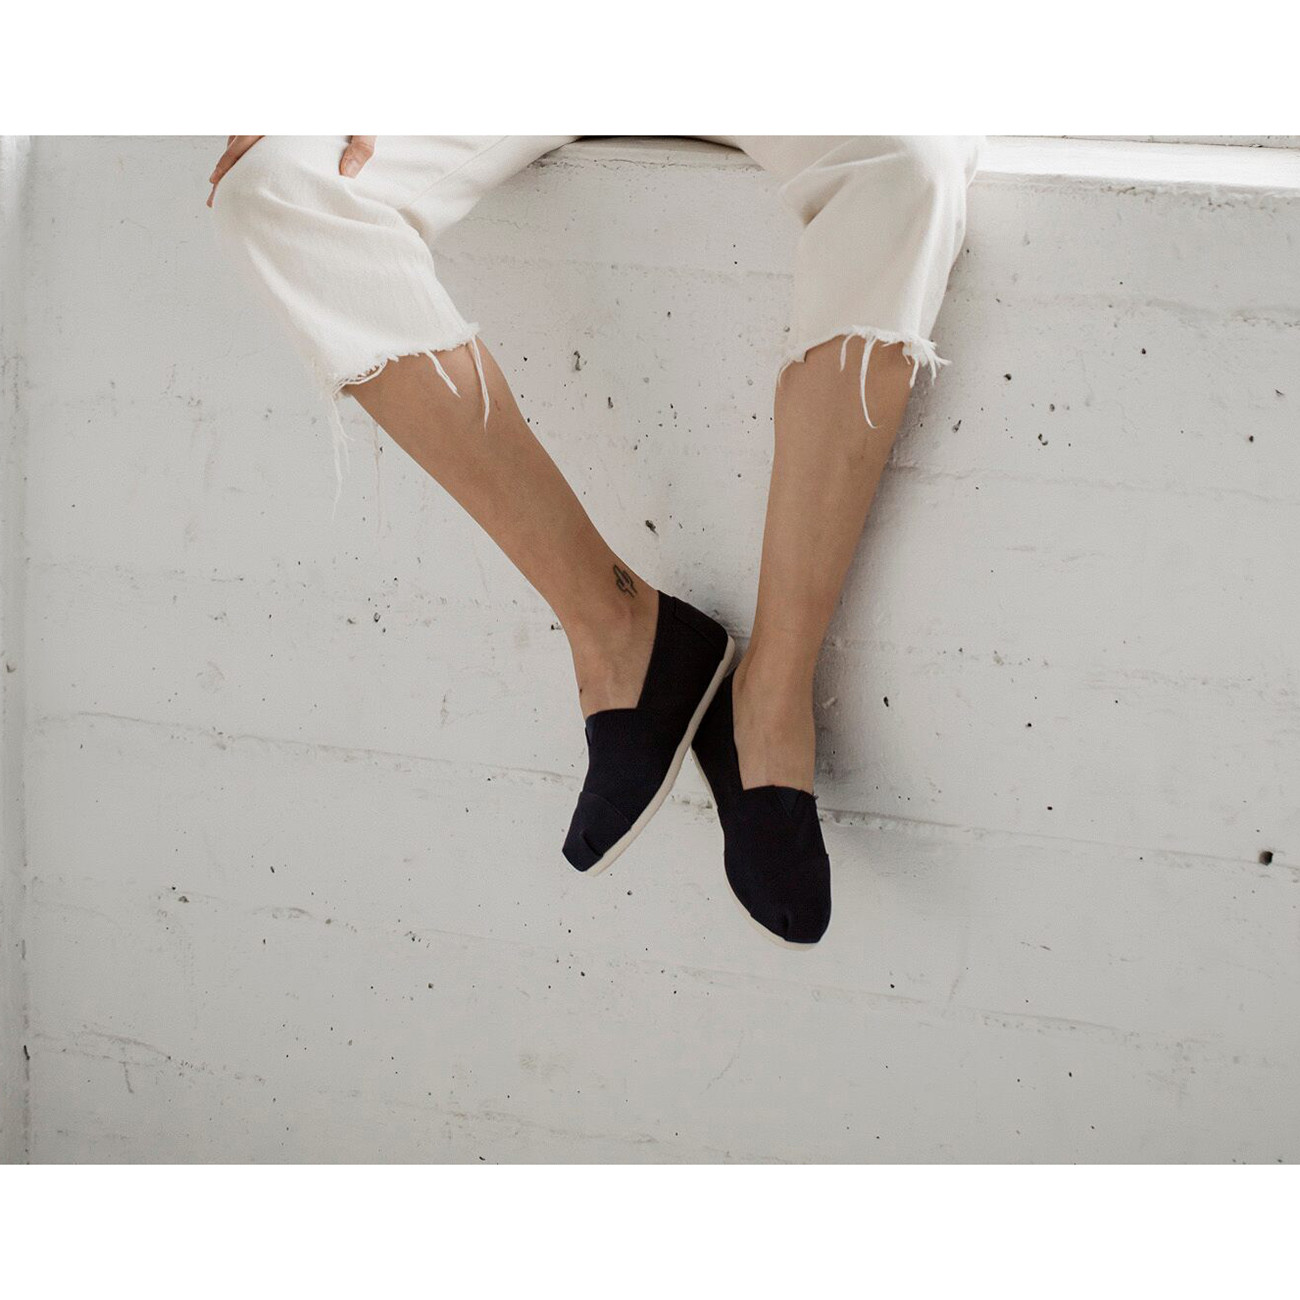 Sneakers Toms Alpargata black canvas